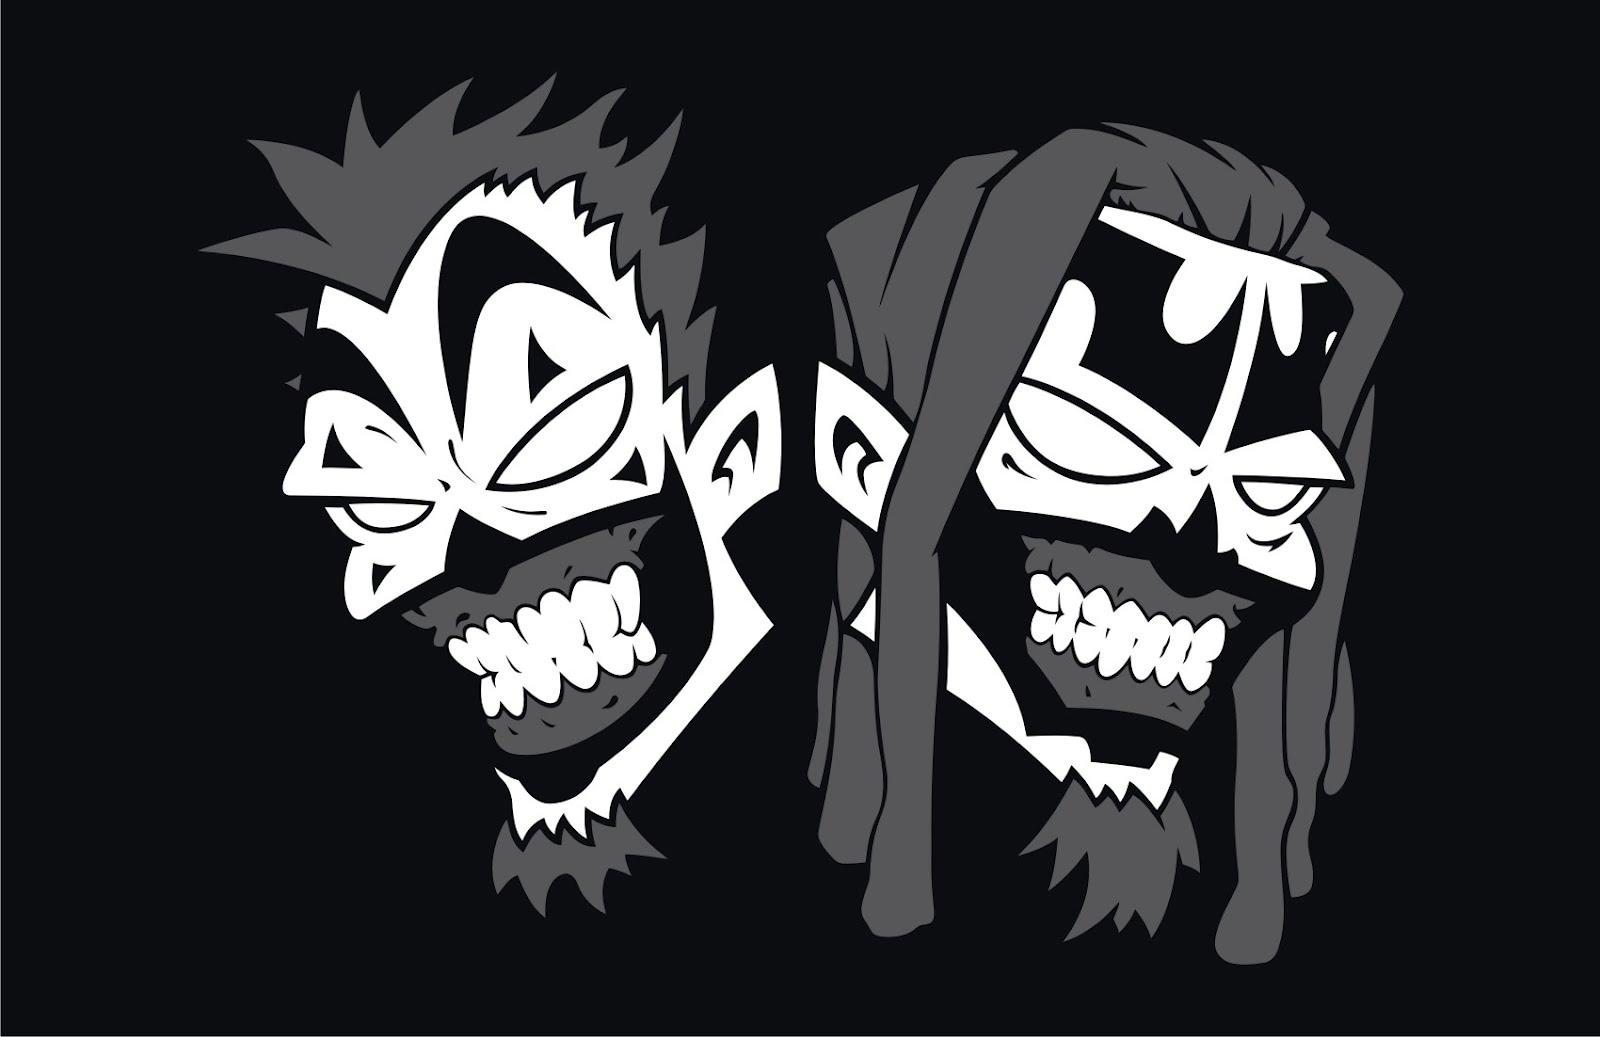 insane_clown_posse-in_yo_face_front_vector